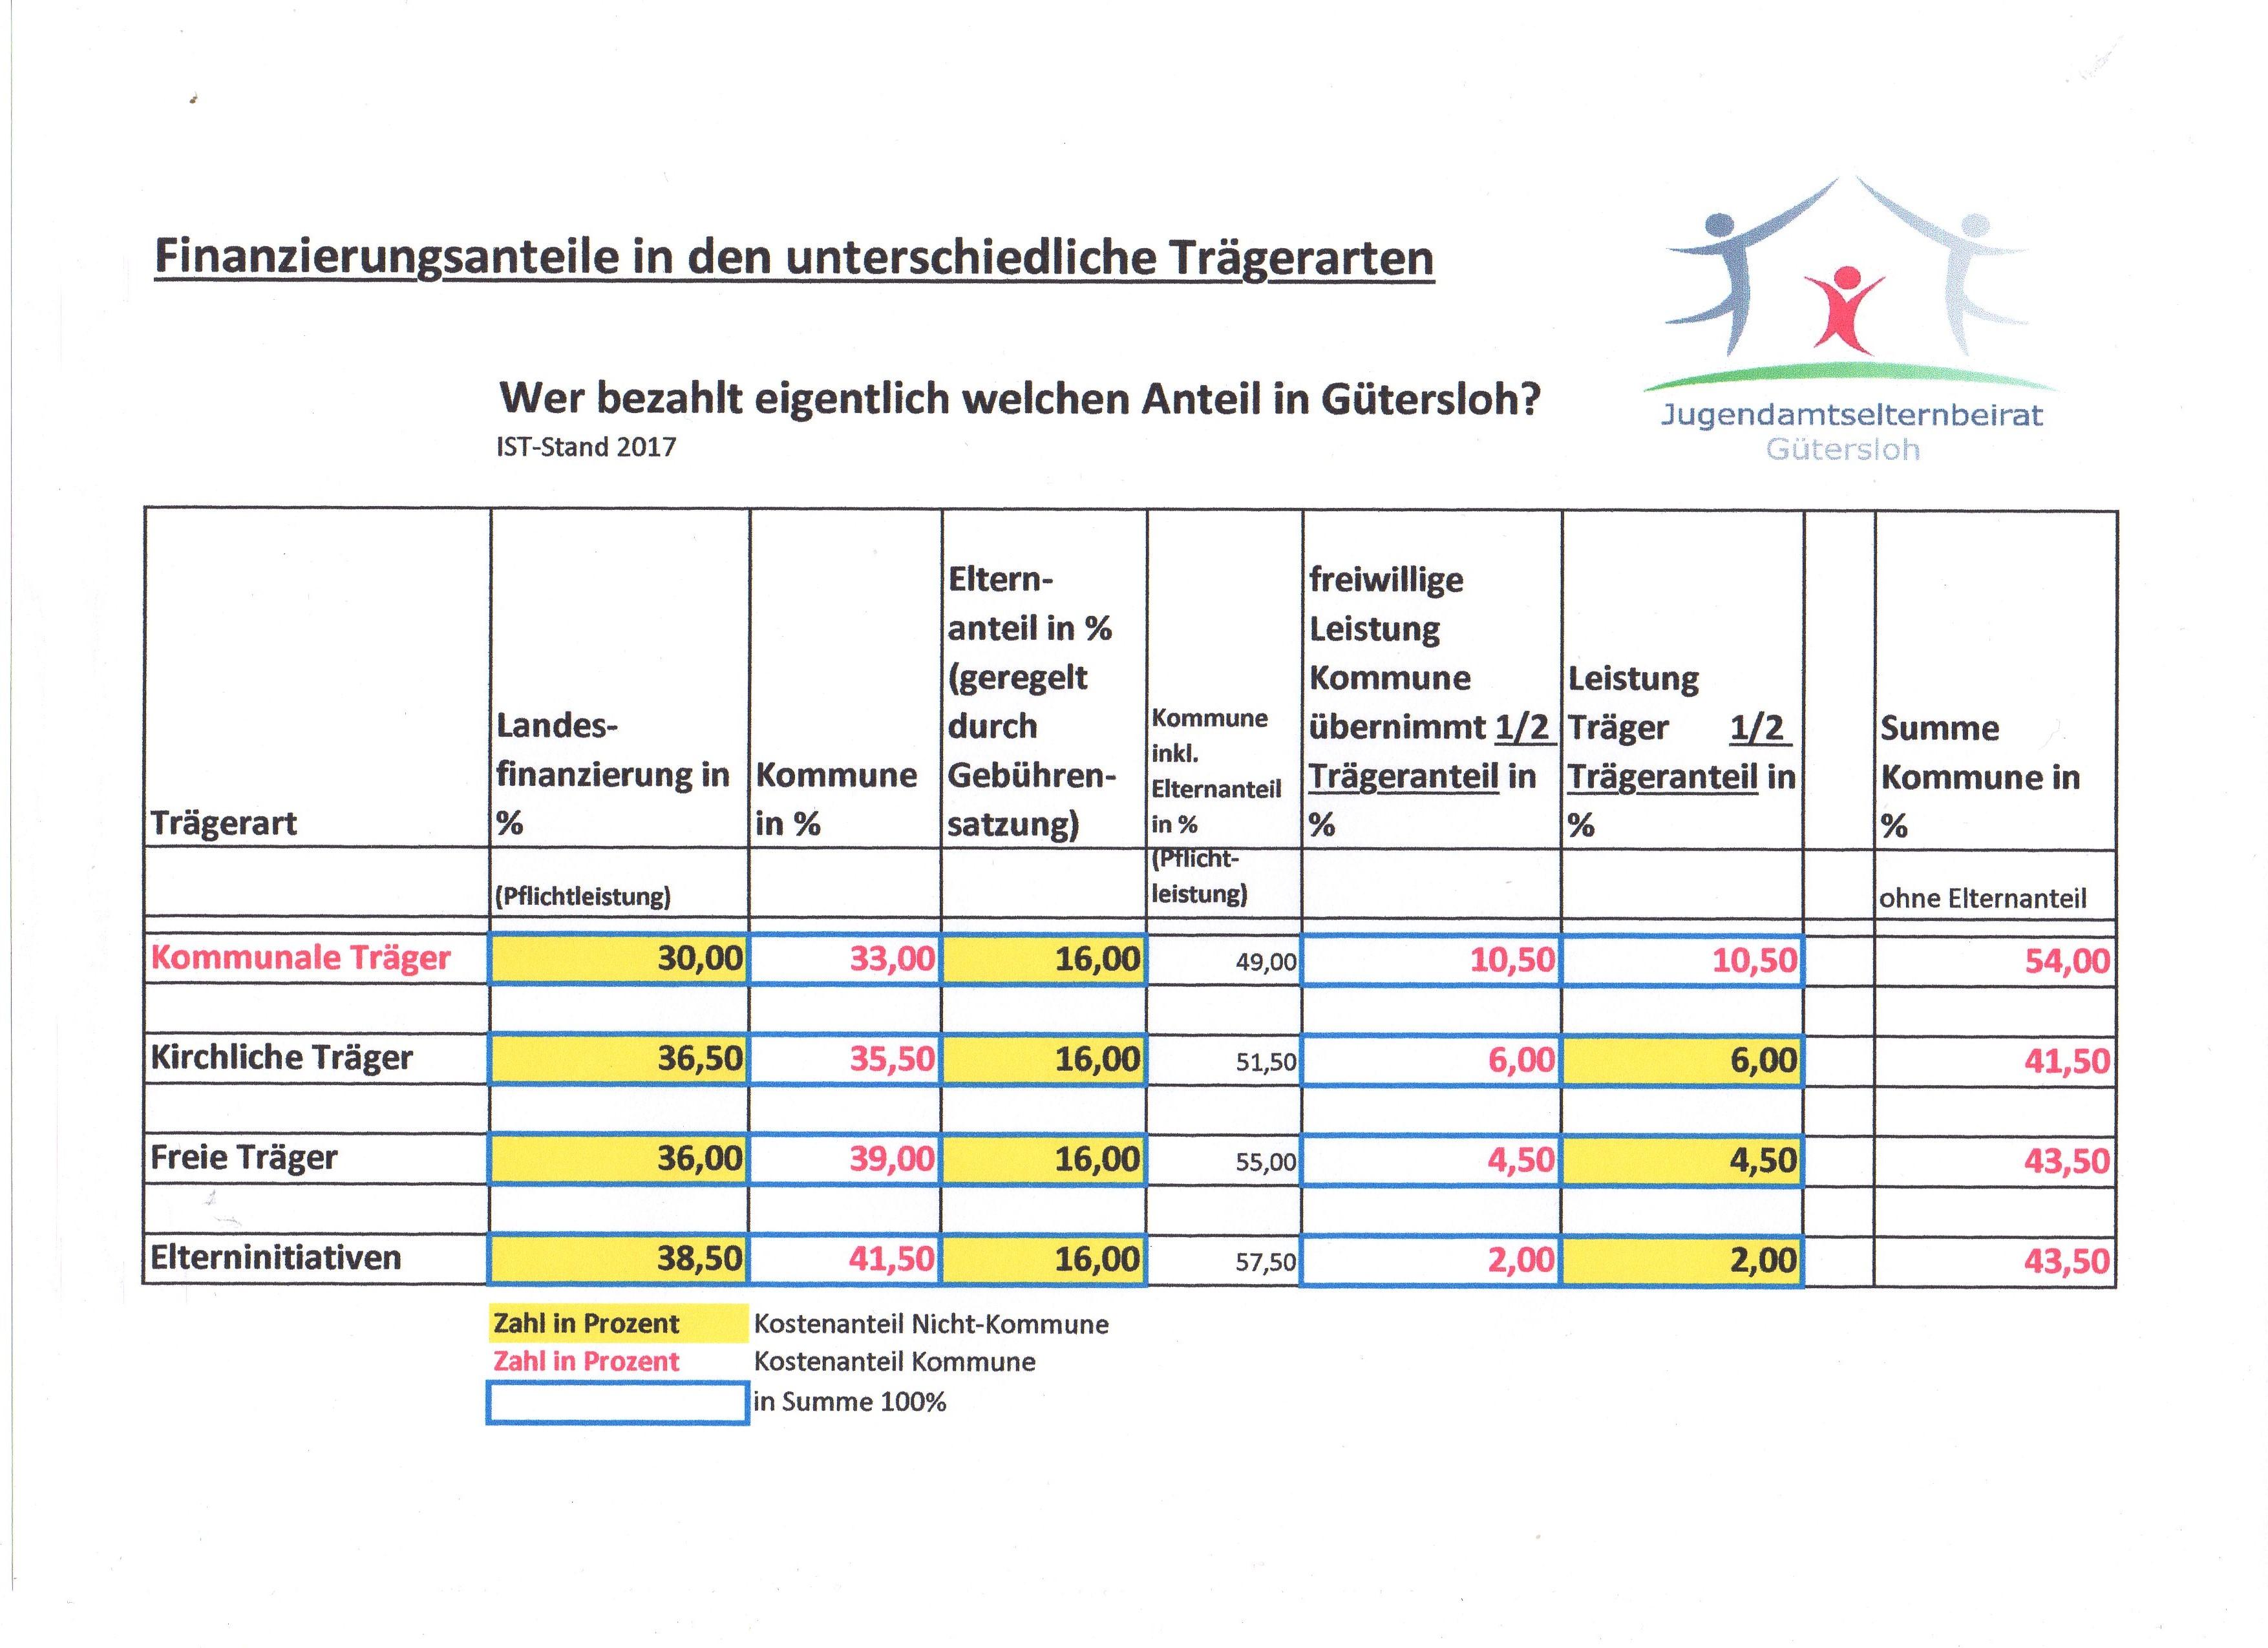 2017-05-04_Finanzierung1